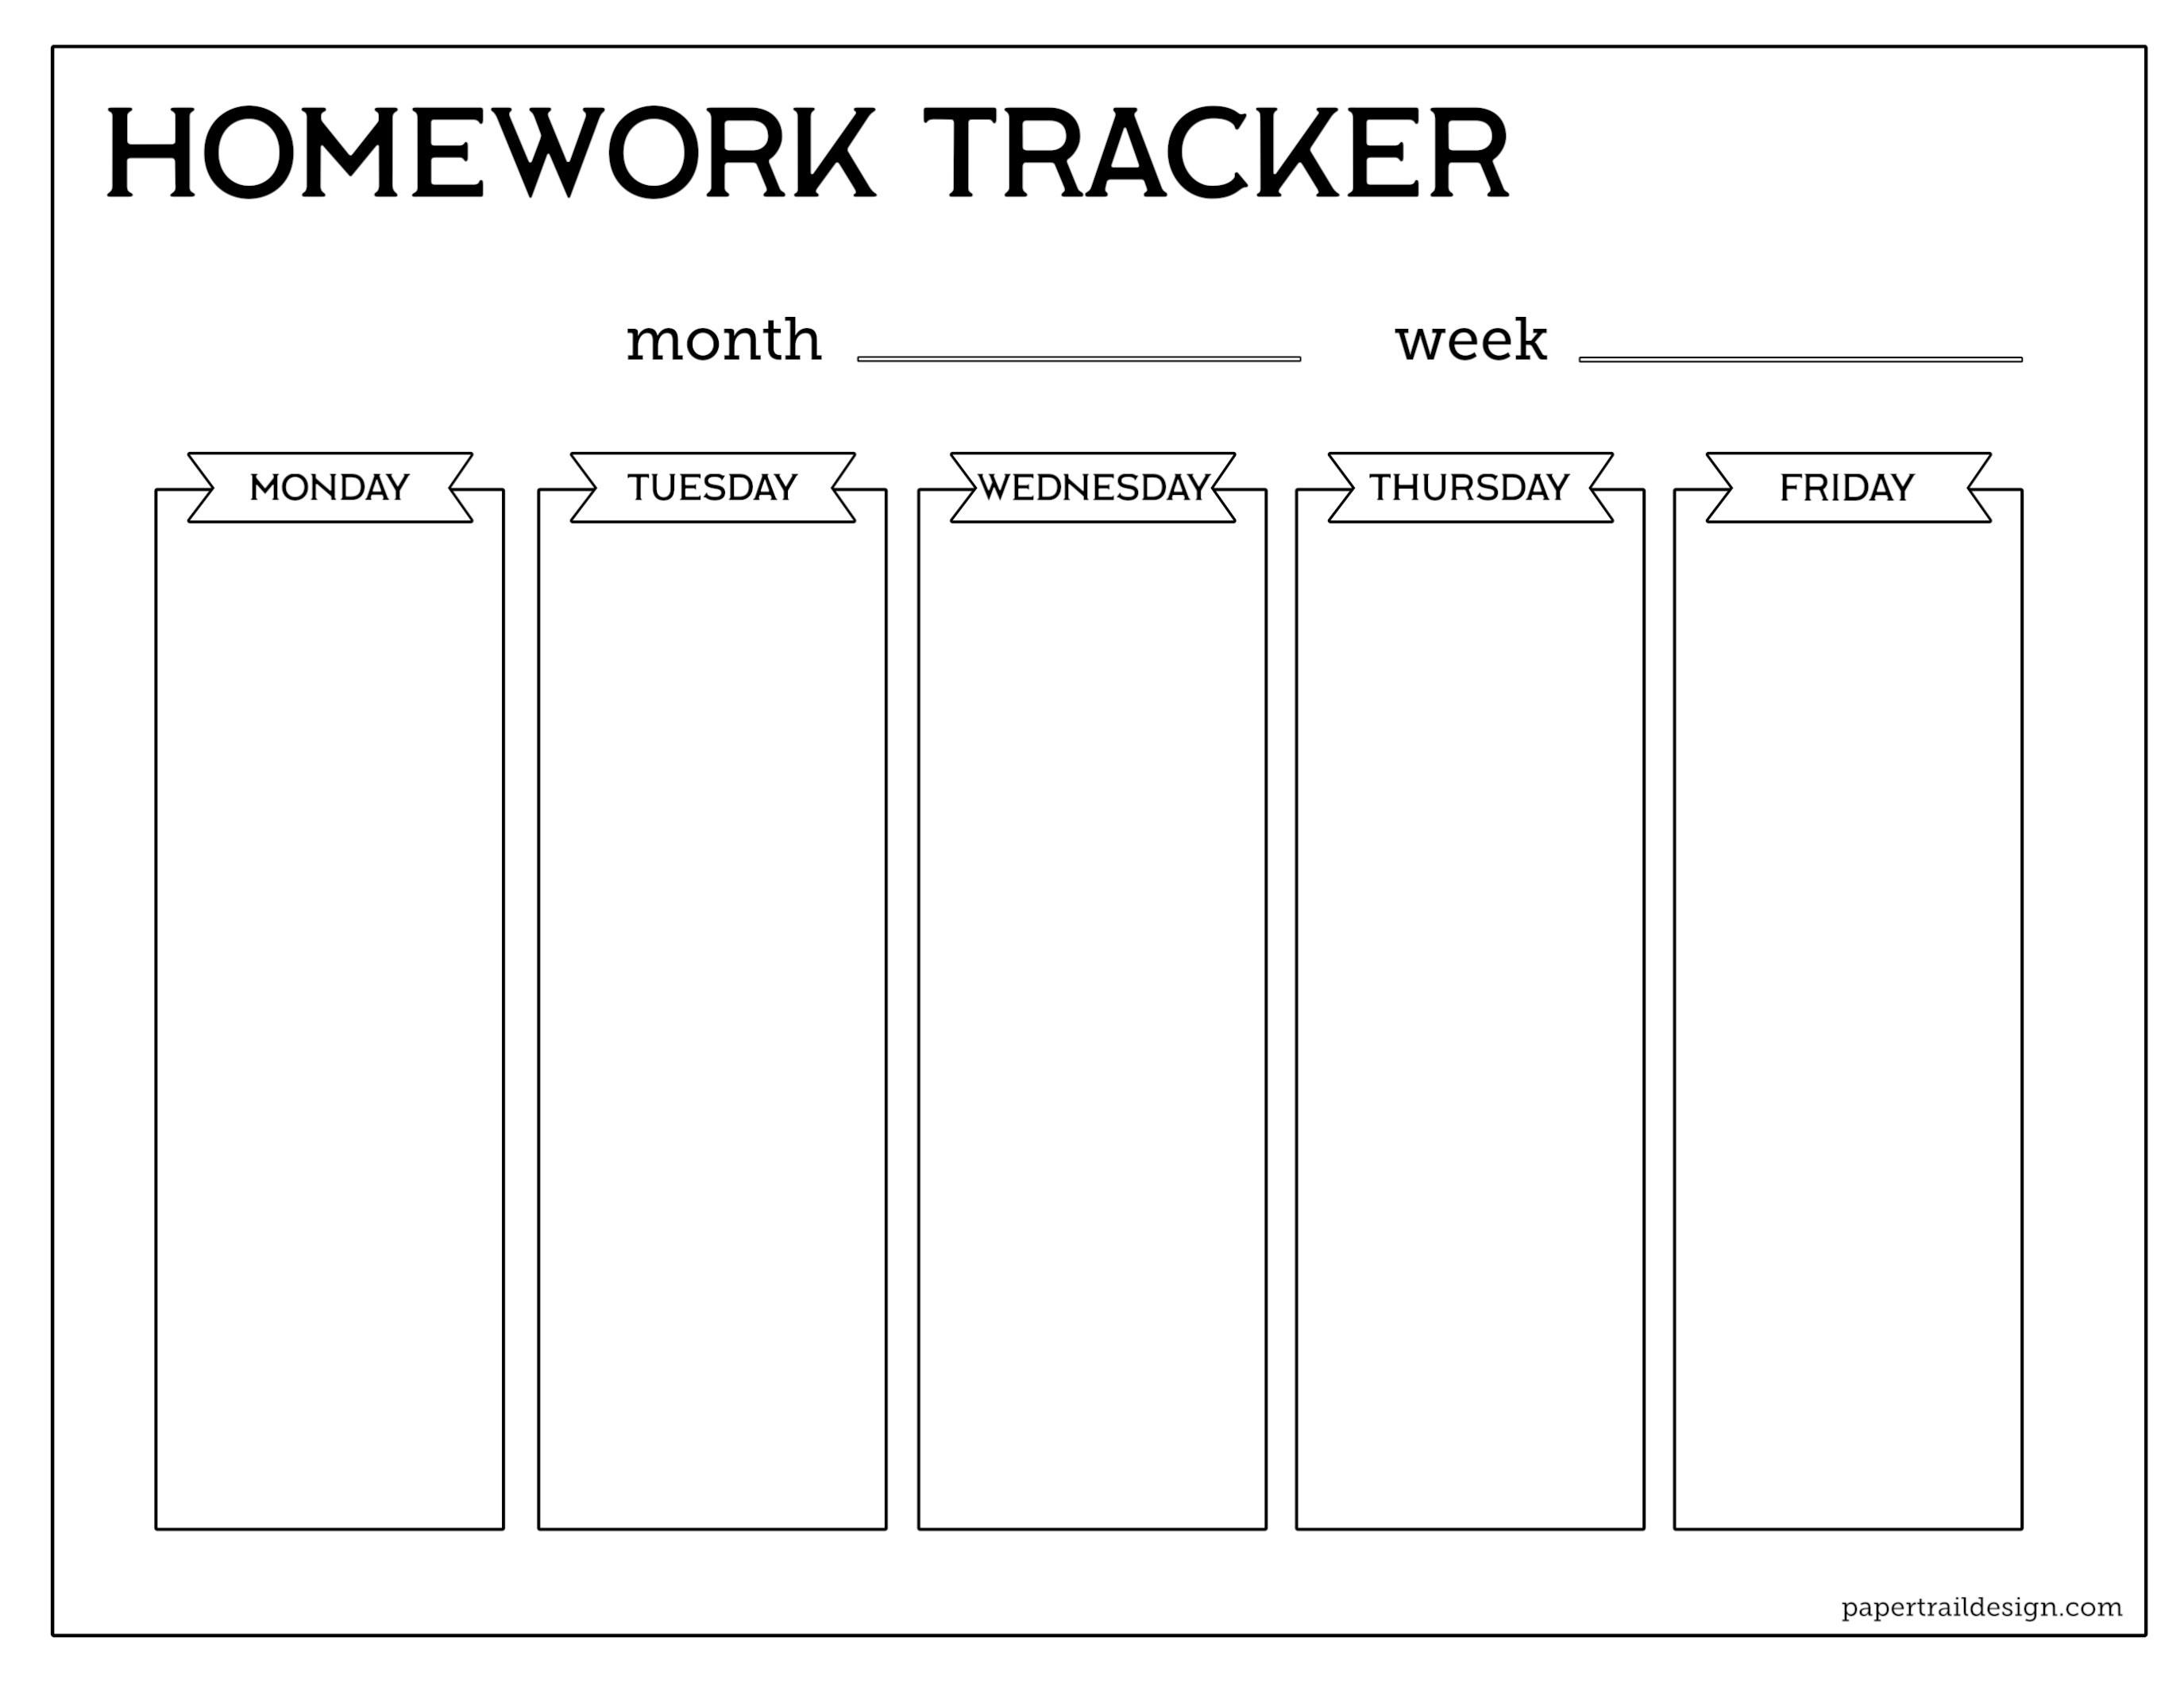 Free Printable Student Homework Planner Template - Paper Trail Design - Free Printable Homework Templates